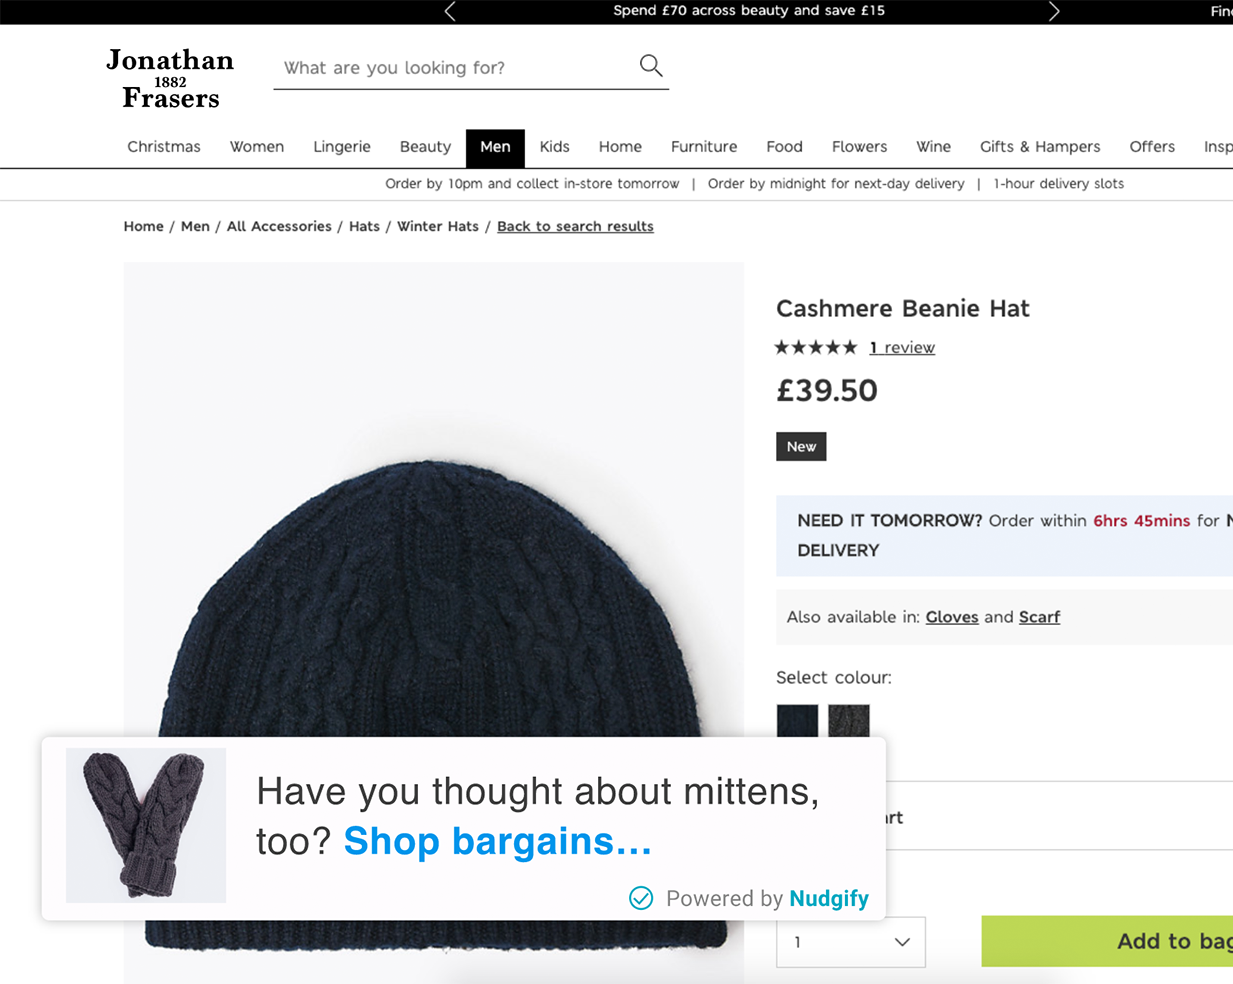 fashion ecommerce cross-sell